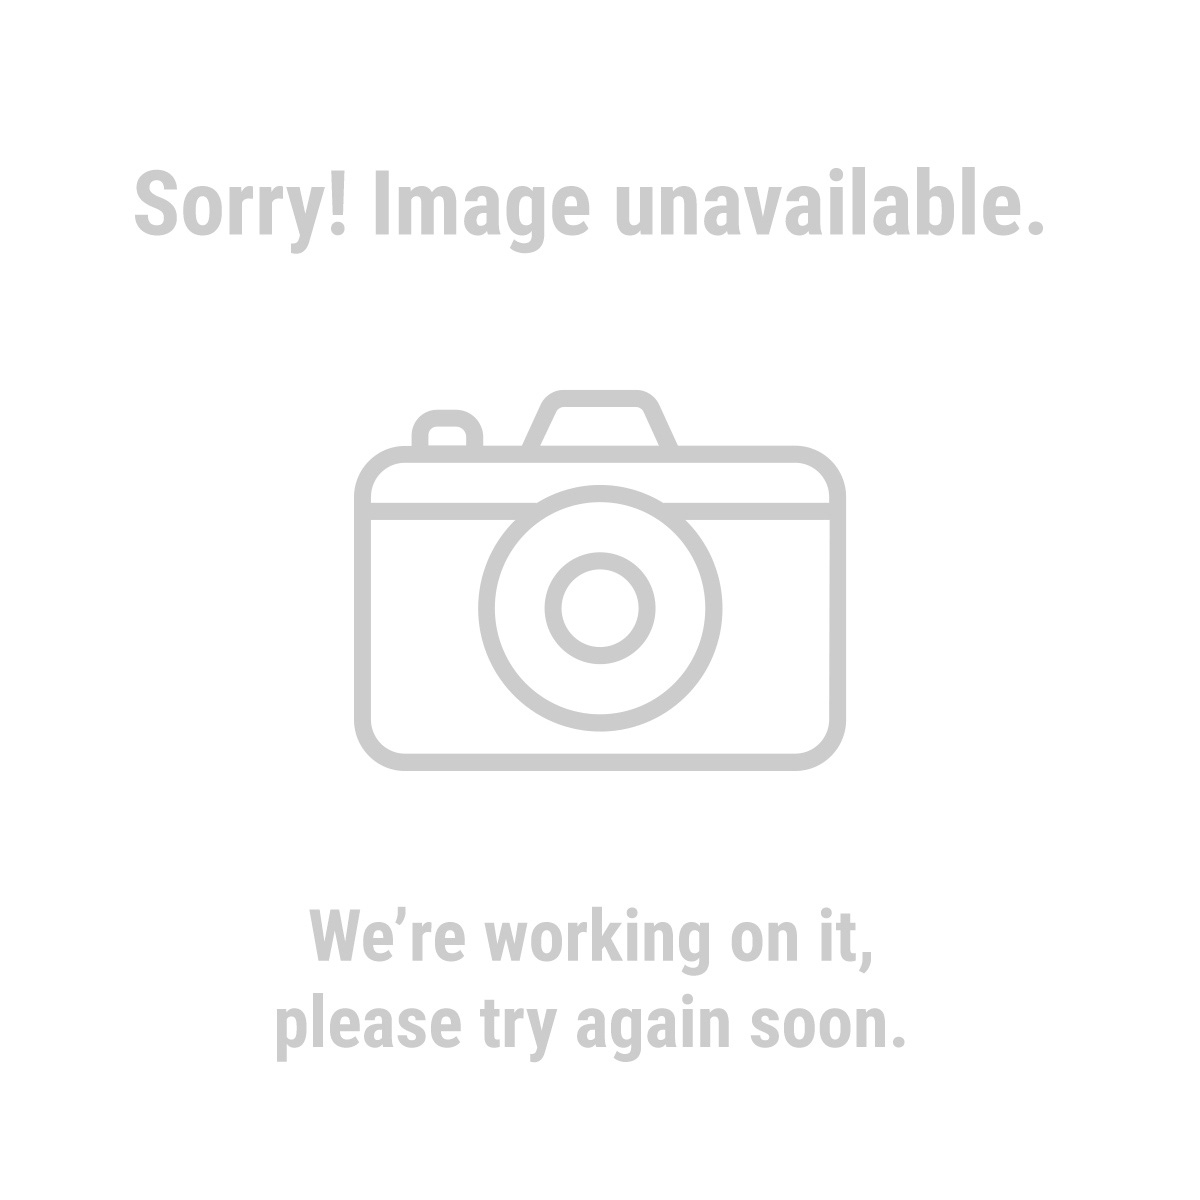 "Haul-Master® 36598 72"" x 96"" Full Size Pickup Cargo Net"